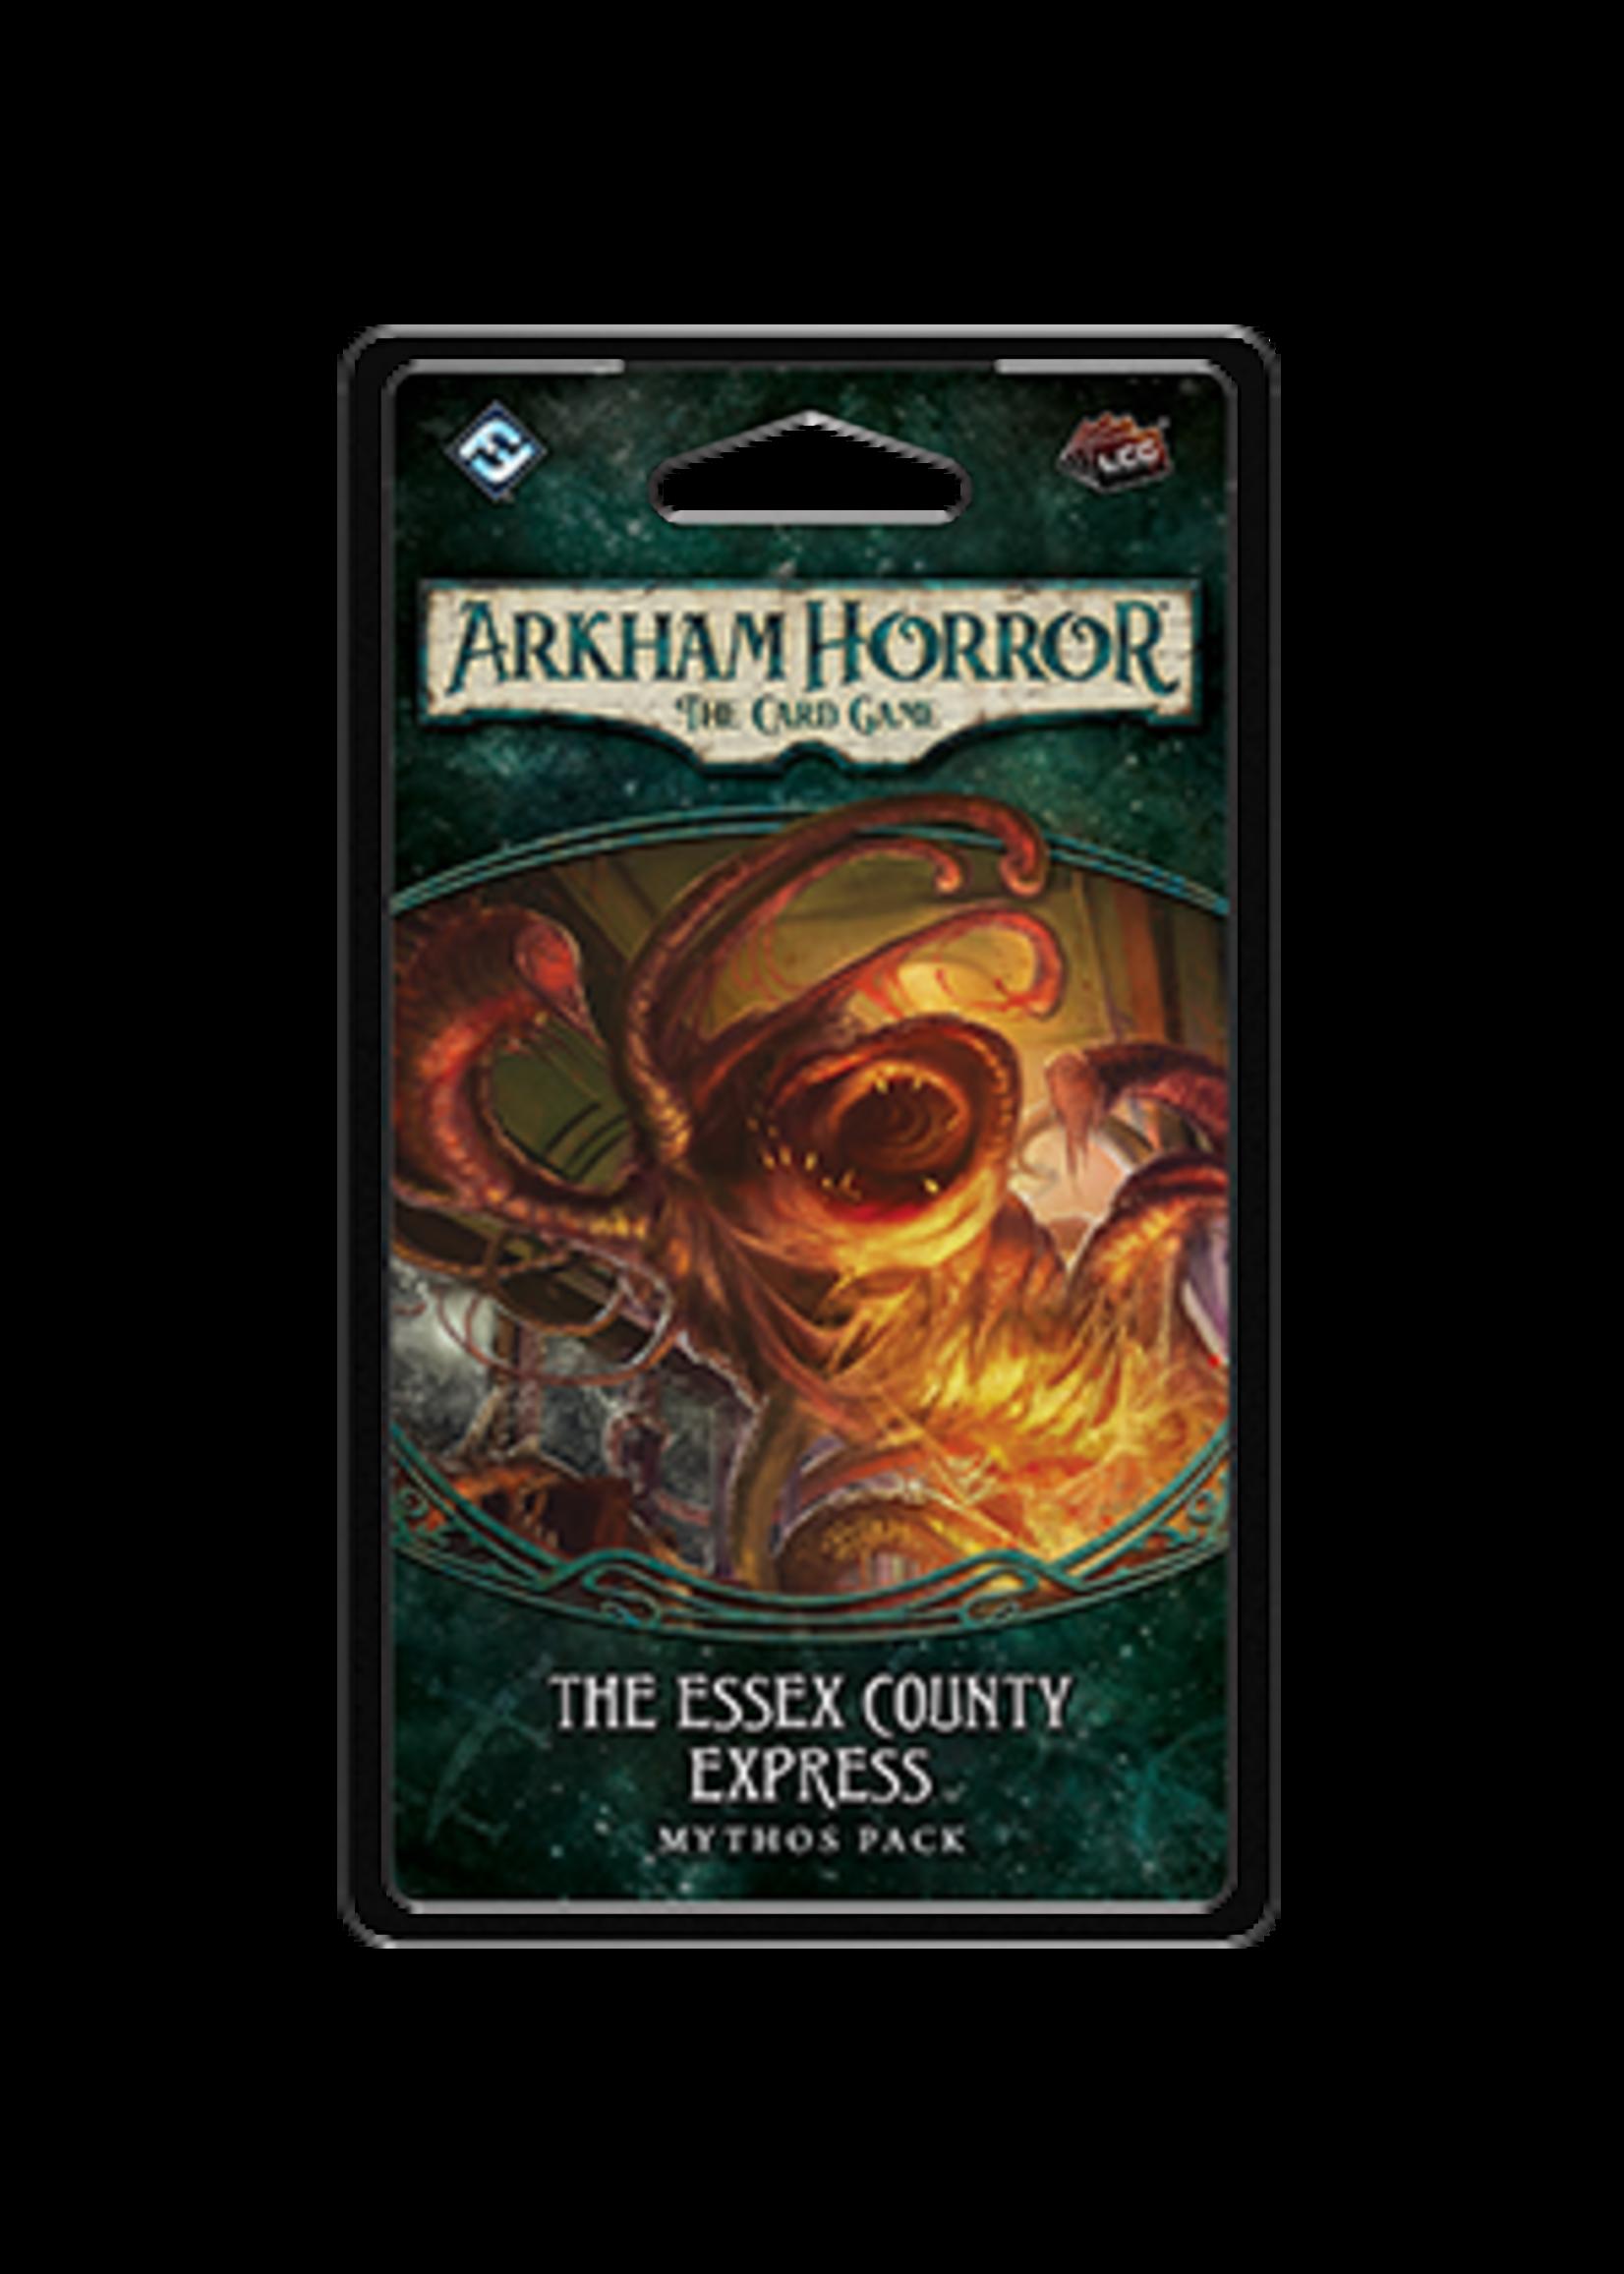 Arkham Horror LCG: The Essex County Express Mythos Pack